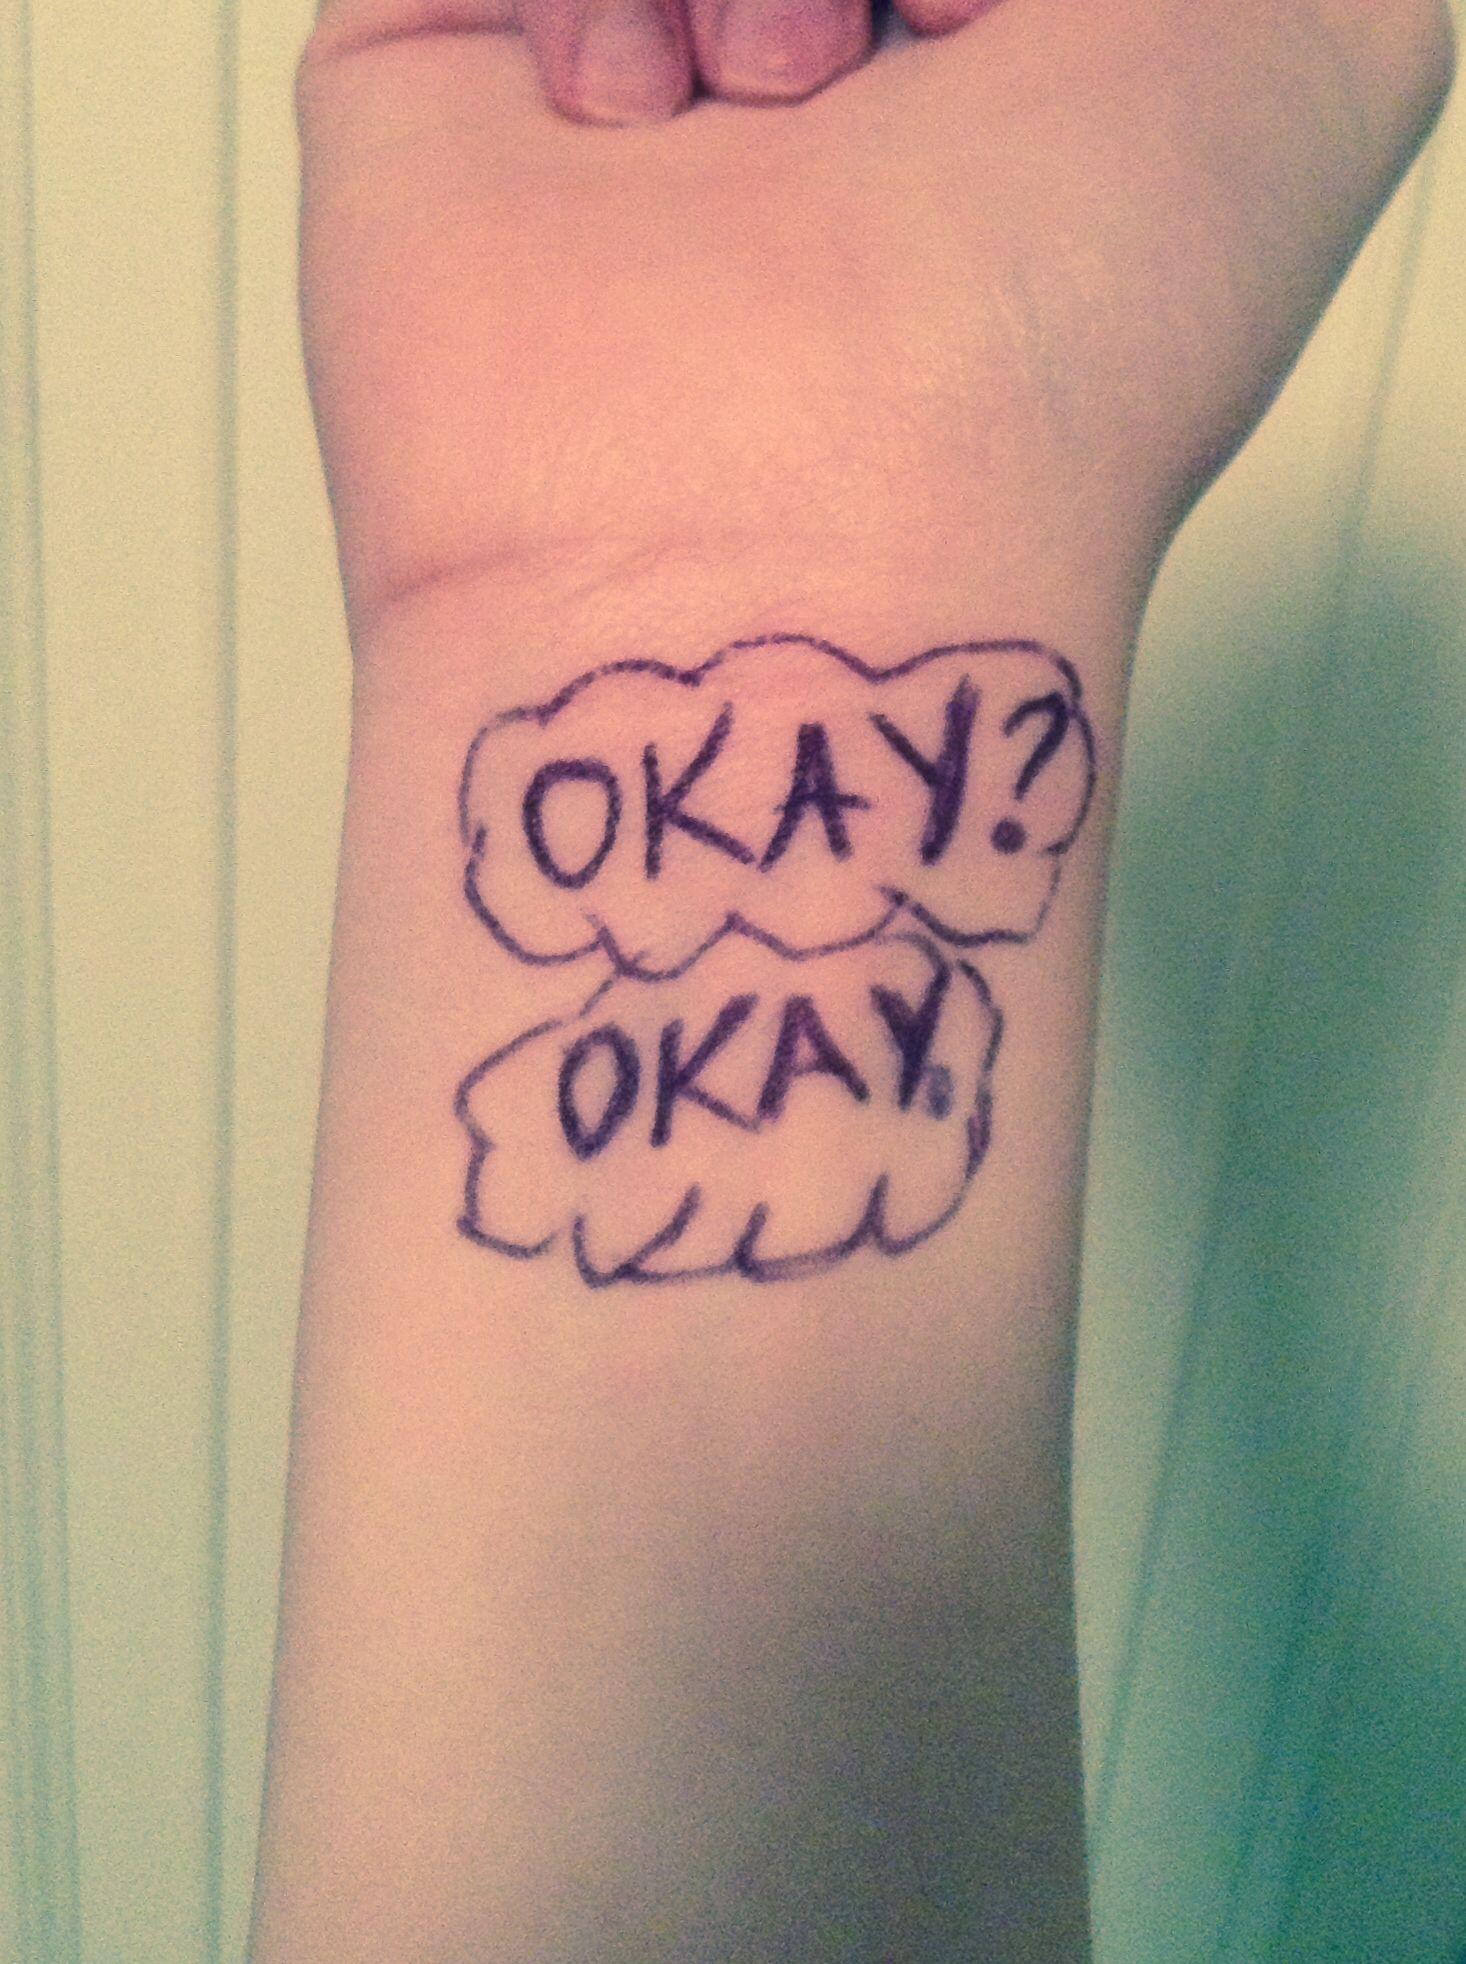 I drew it on, so it's kinda sloppy. Still love it